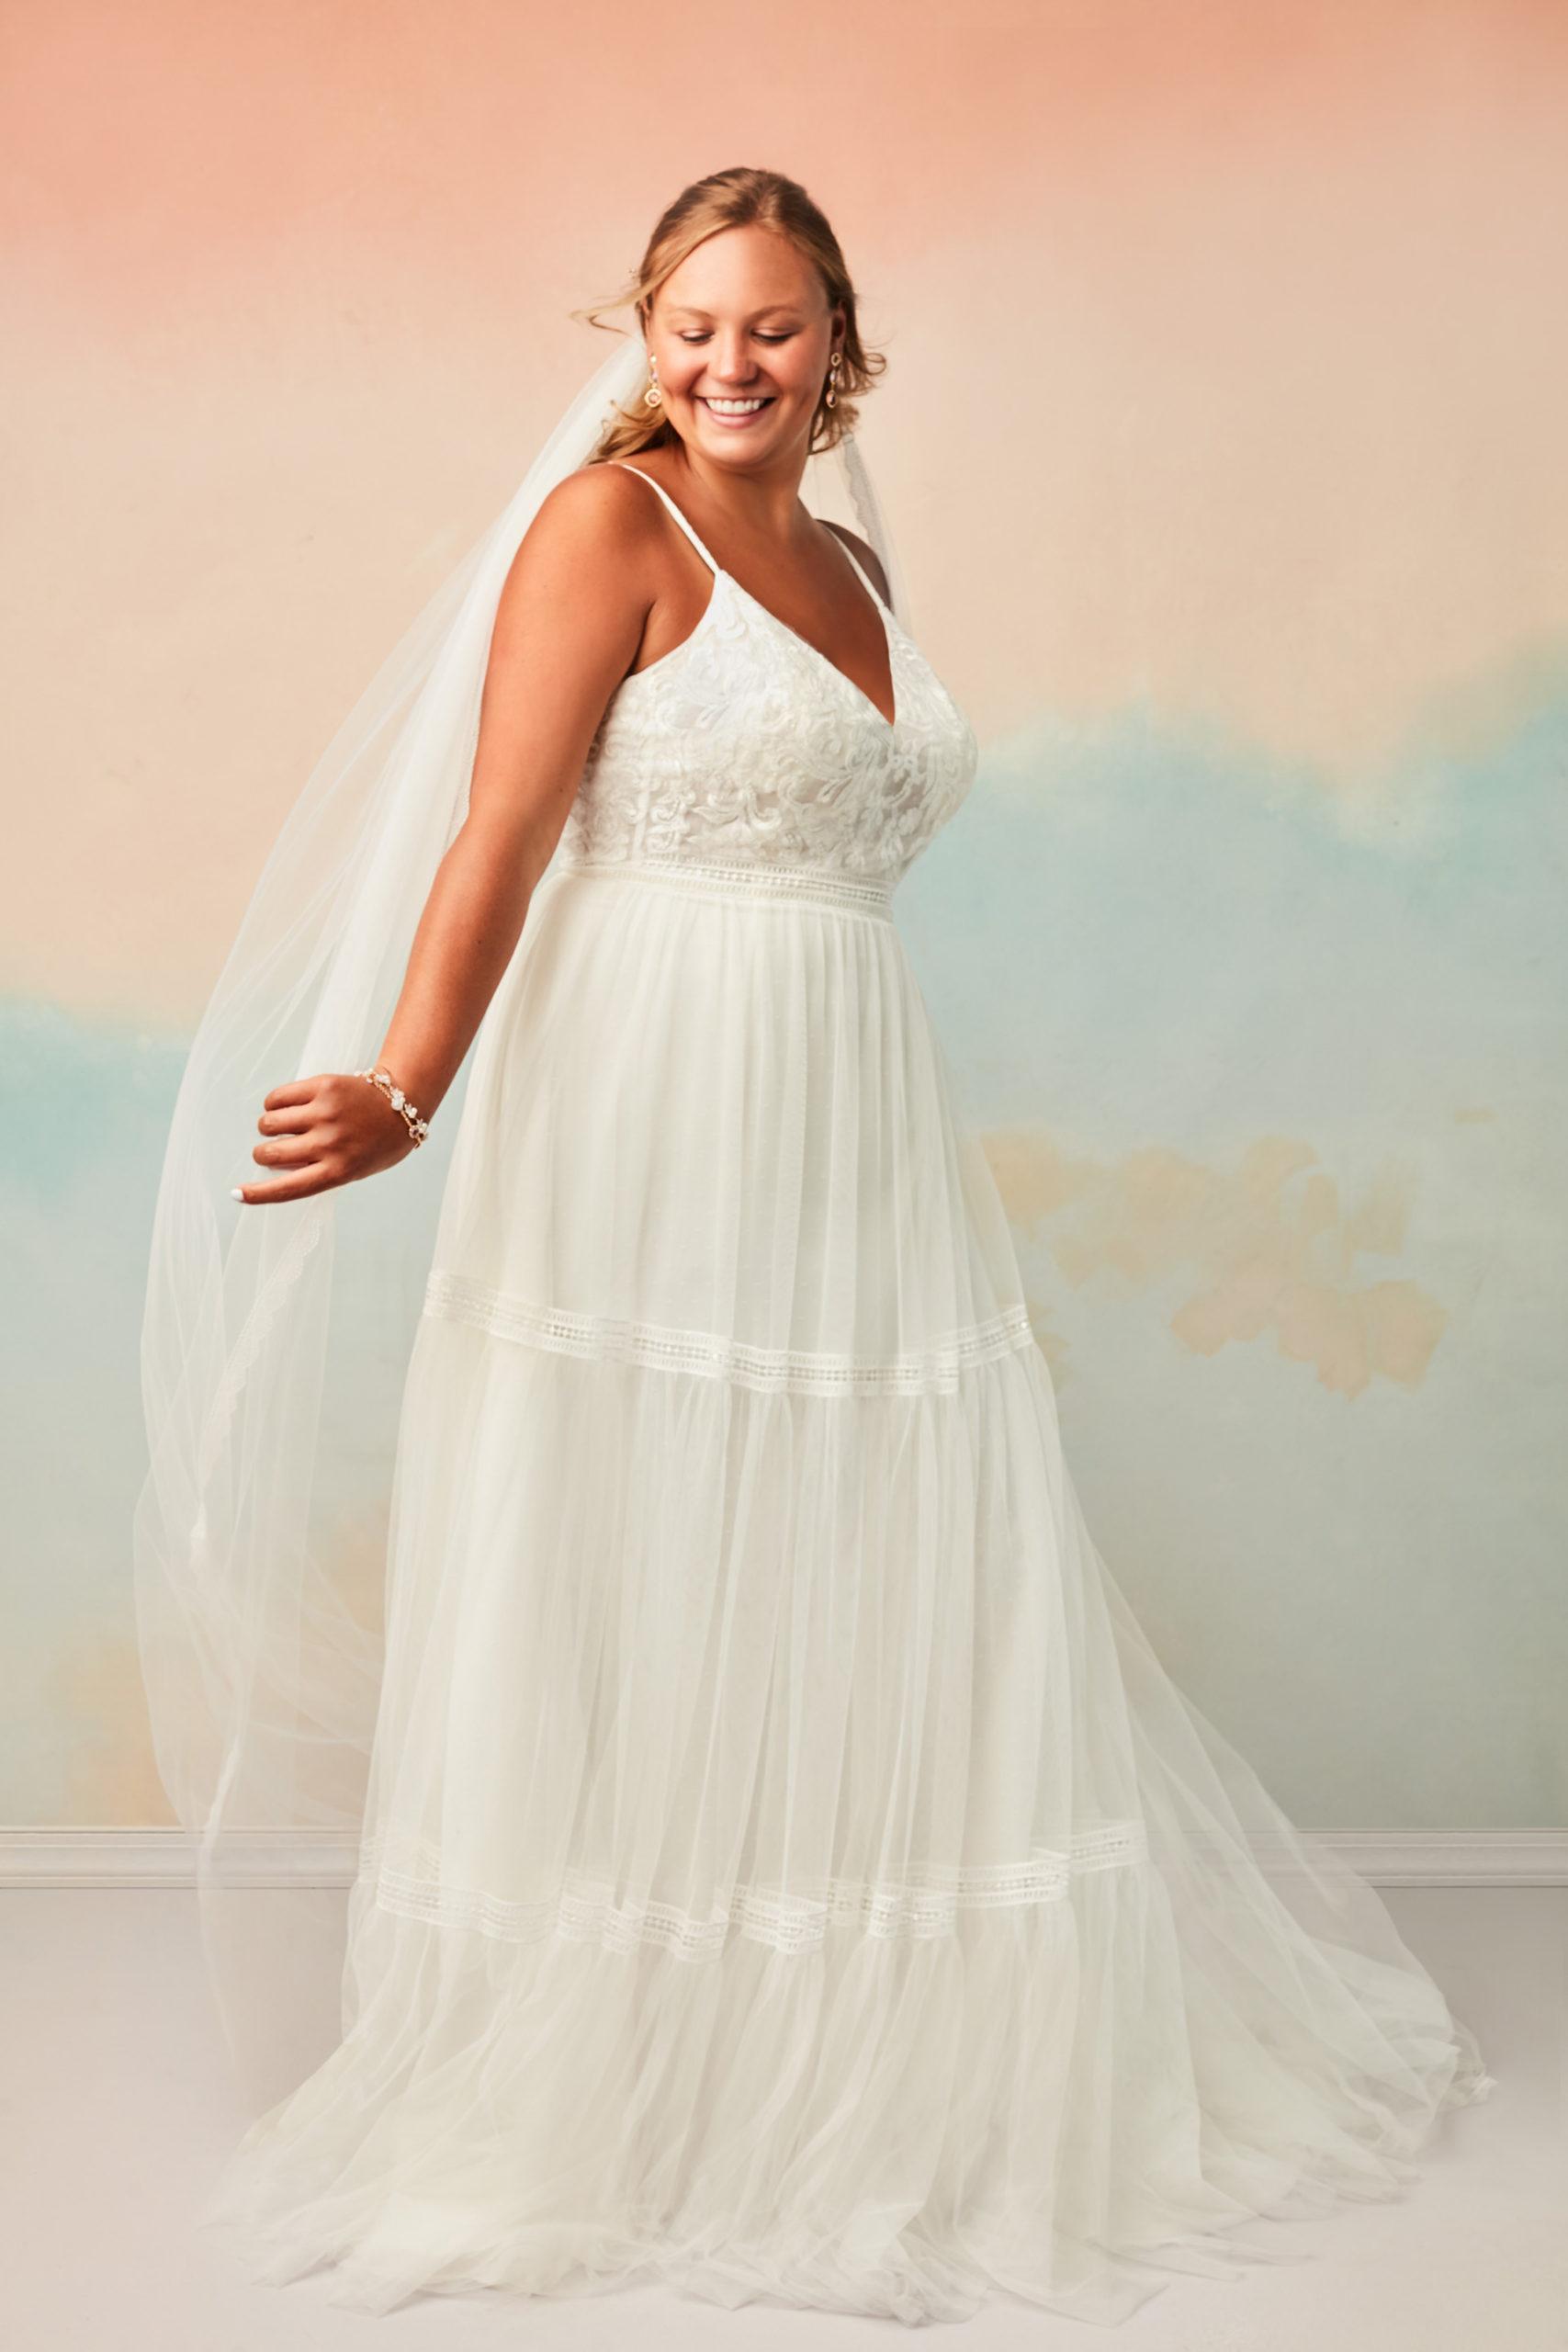 Bride wearing a boho inspired wedding dress